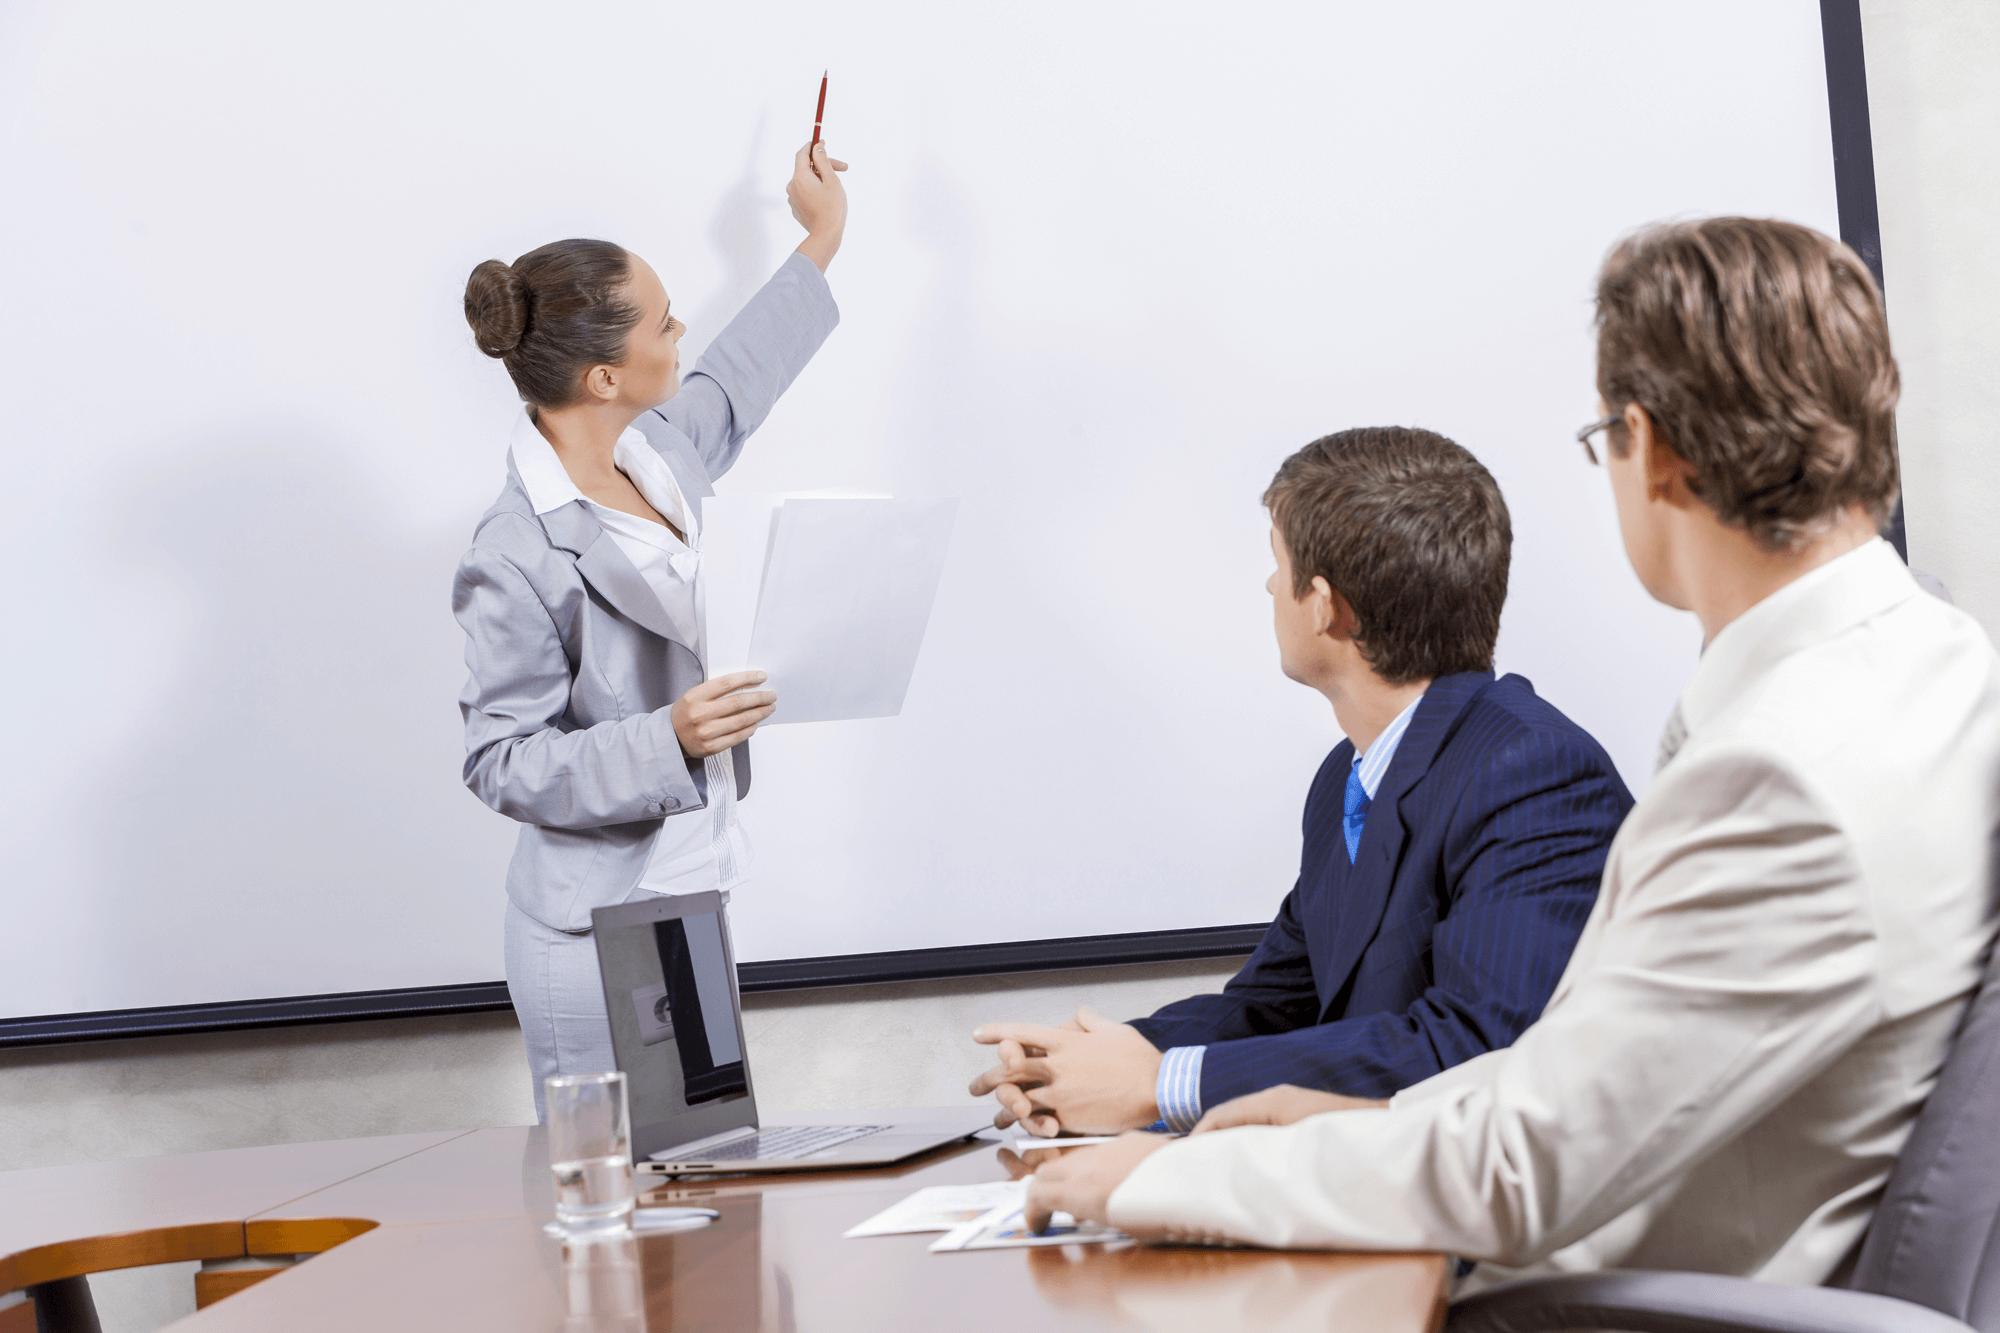 Independent Advice | Organization advice | Working smarter